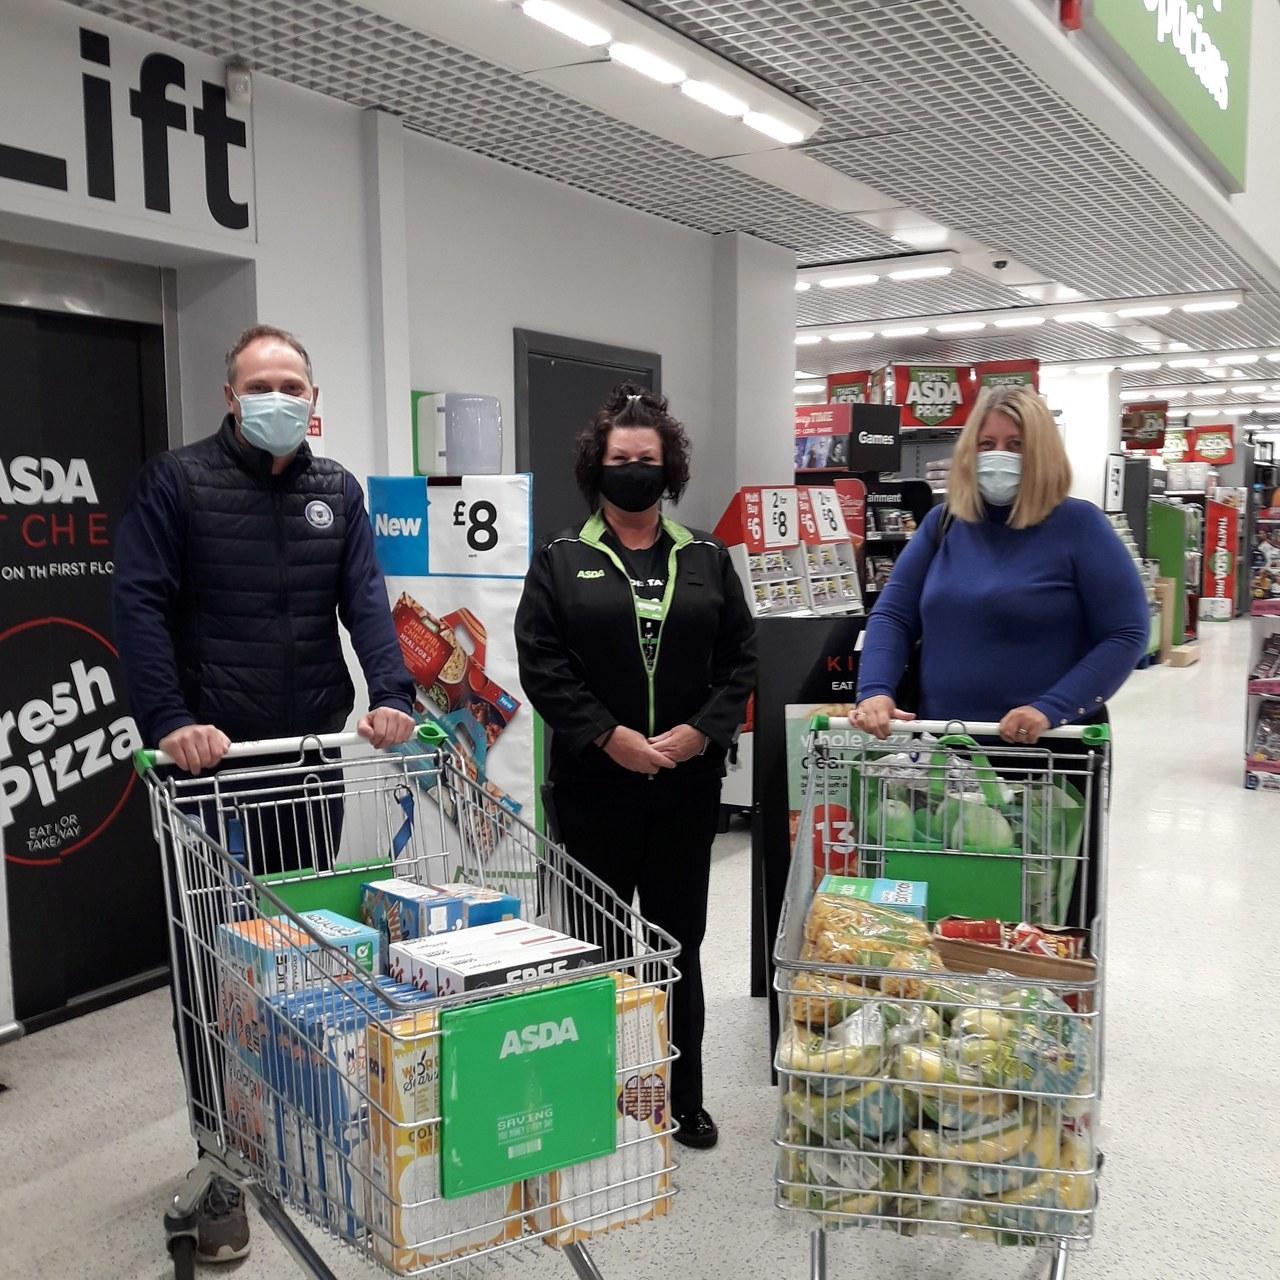 Peterborough UTD foundation receiving food donation for vulnerable families | Asda Peterborough